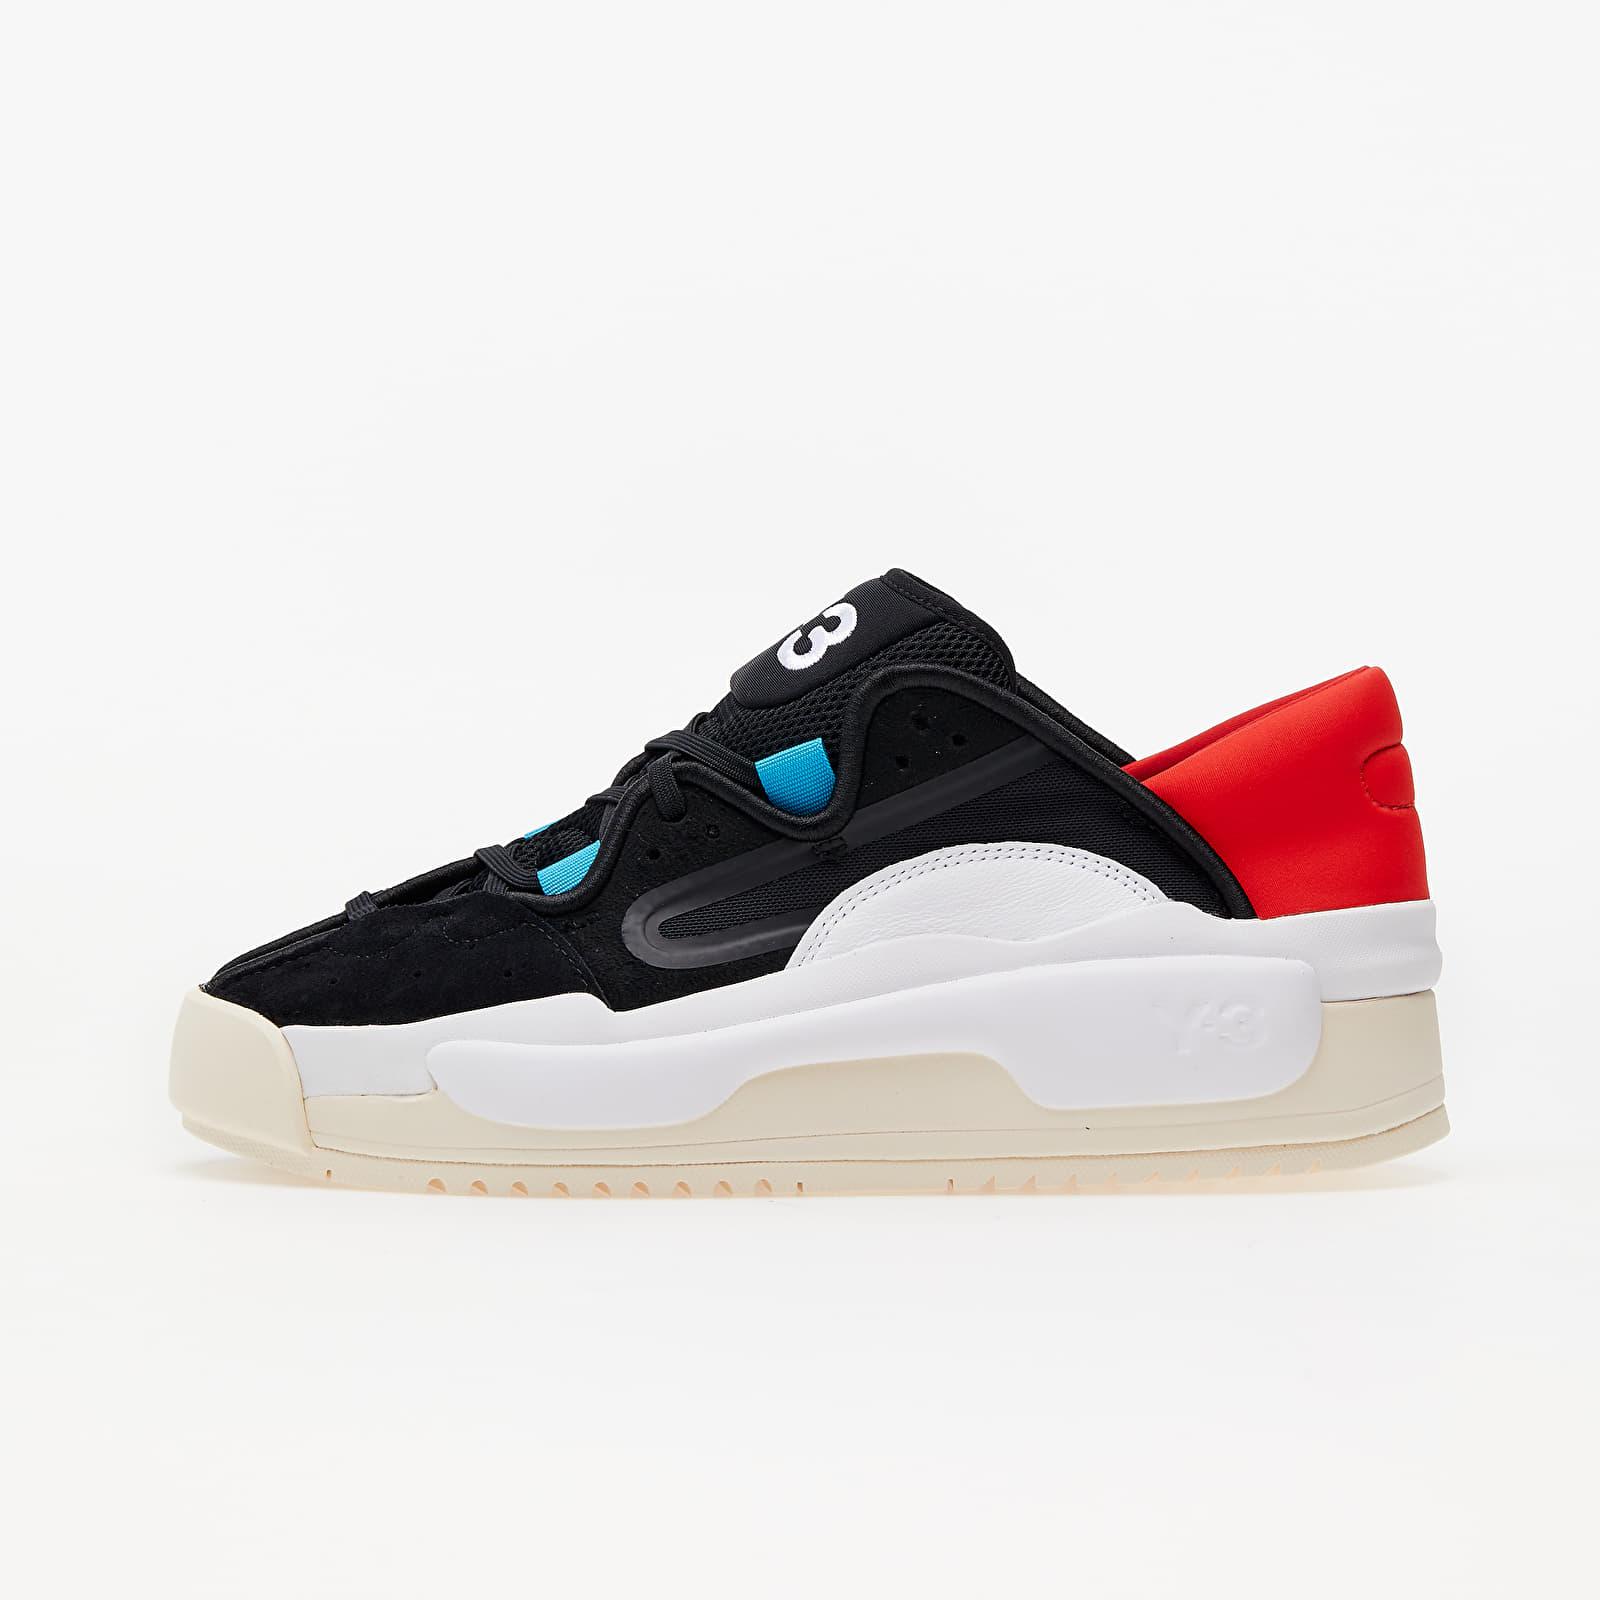 Chaussures et baskets homme Y-3 Hokori II Sand/ Black/ Red